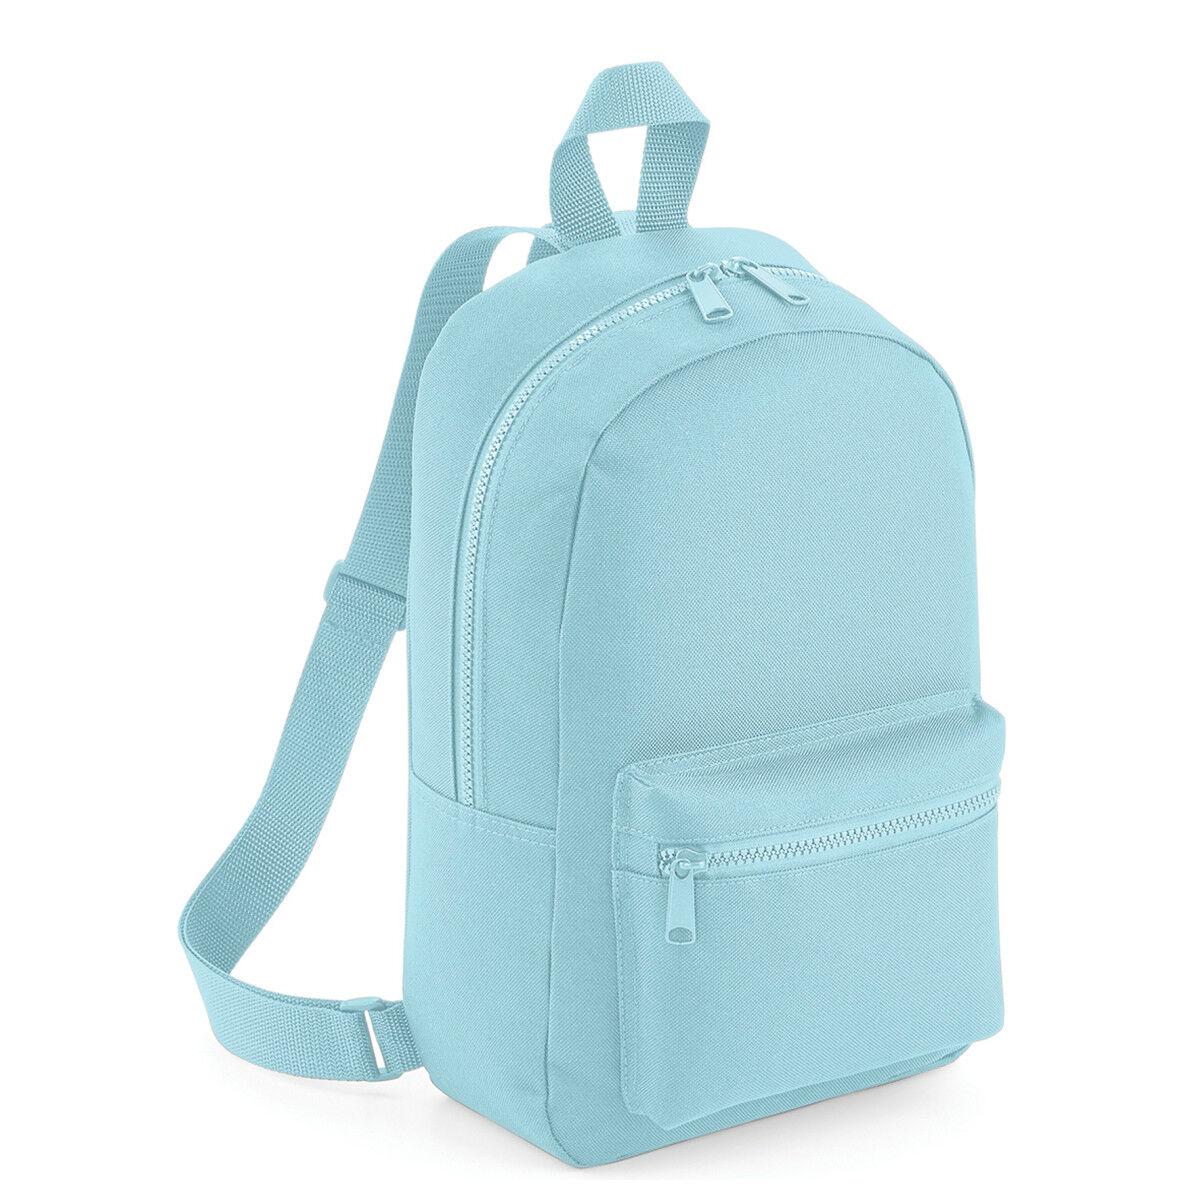 Basebag Fashion Backpack (Powder Blue)